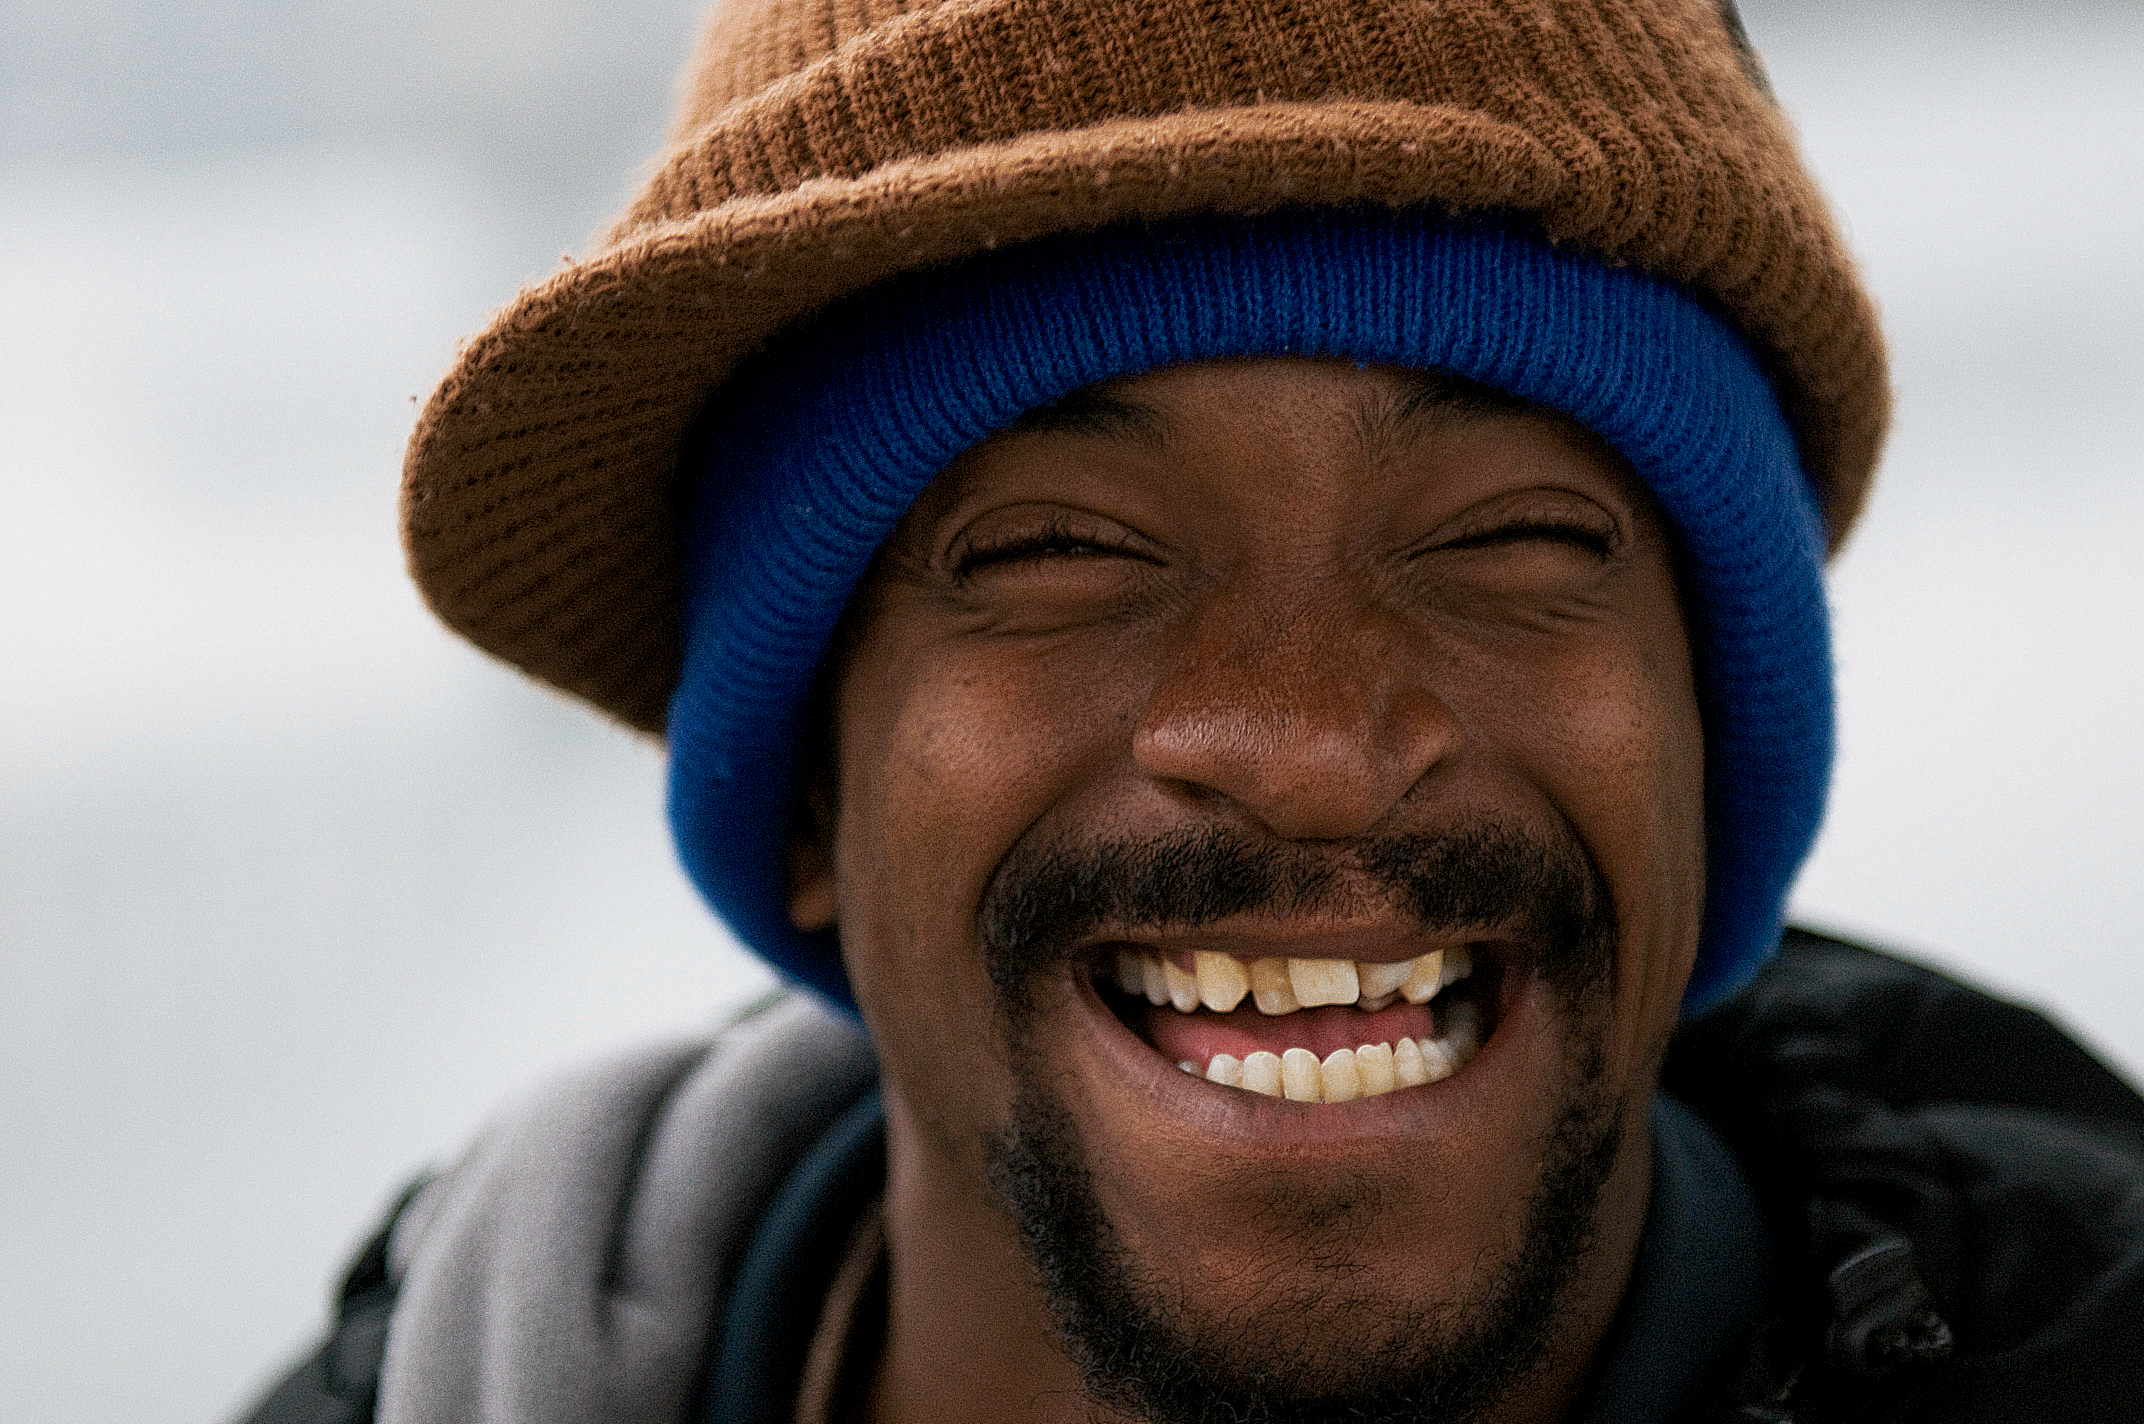 Smiling homeless photo